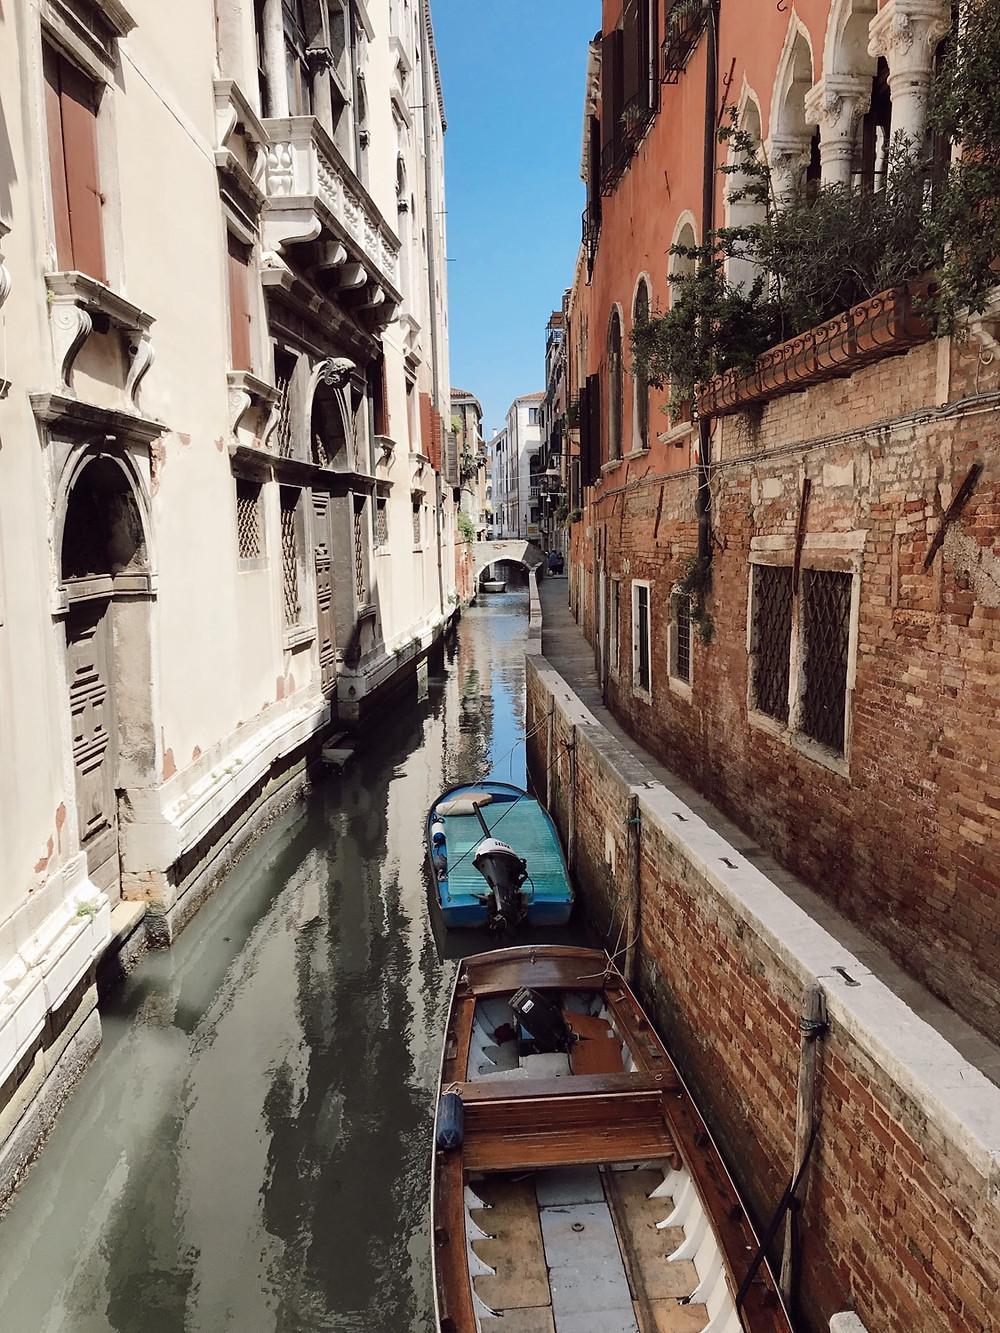 Canals, Bridges & Waterways Venice